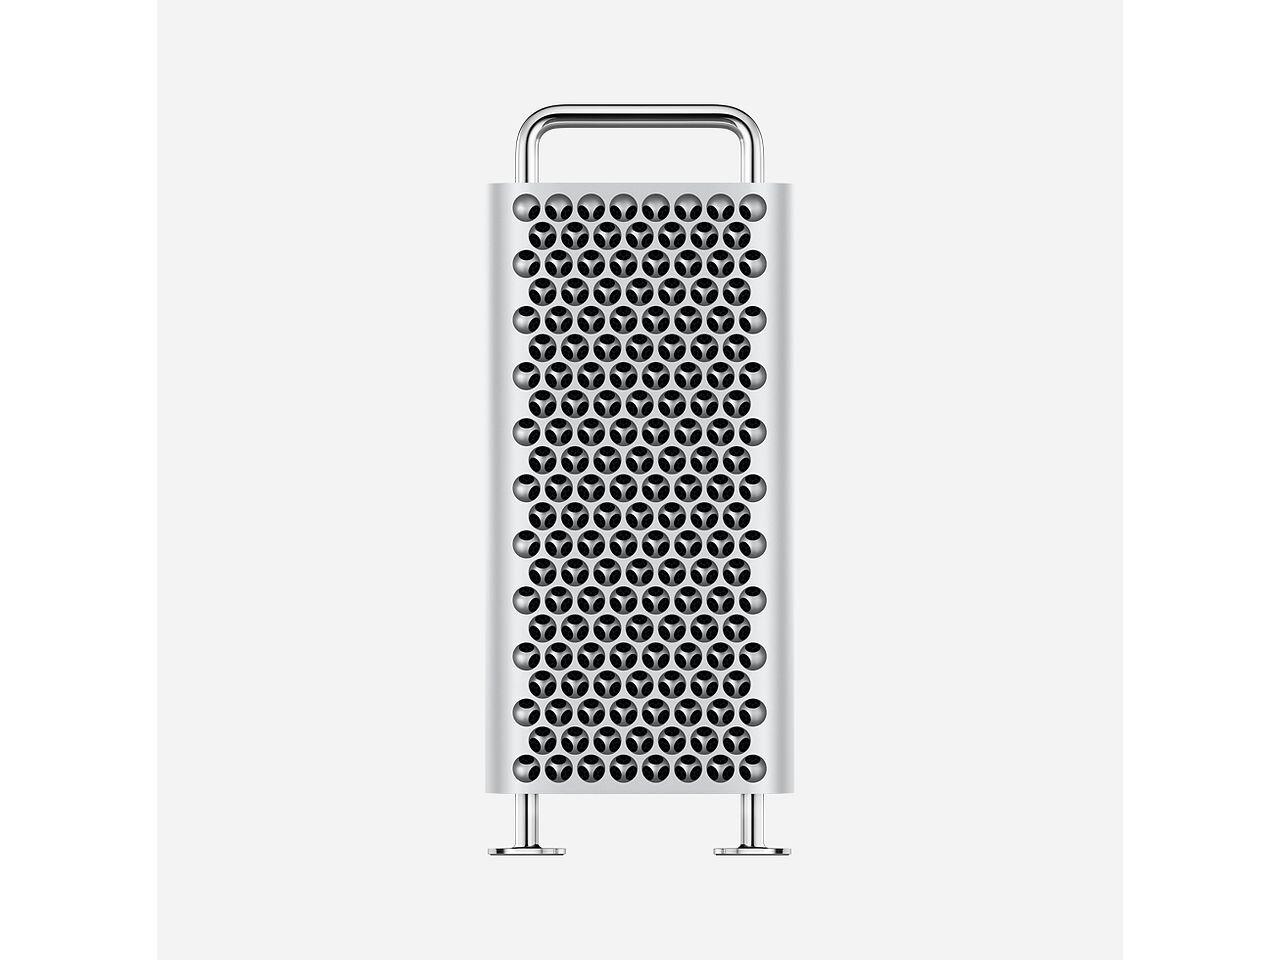 mac pro tower 2019